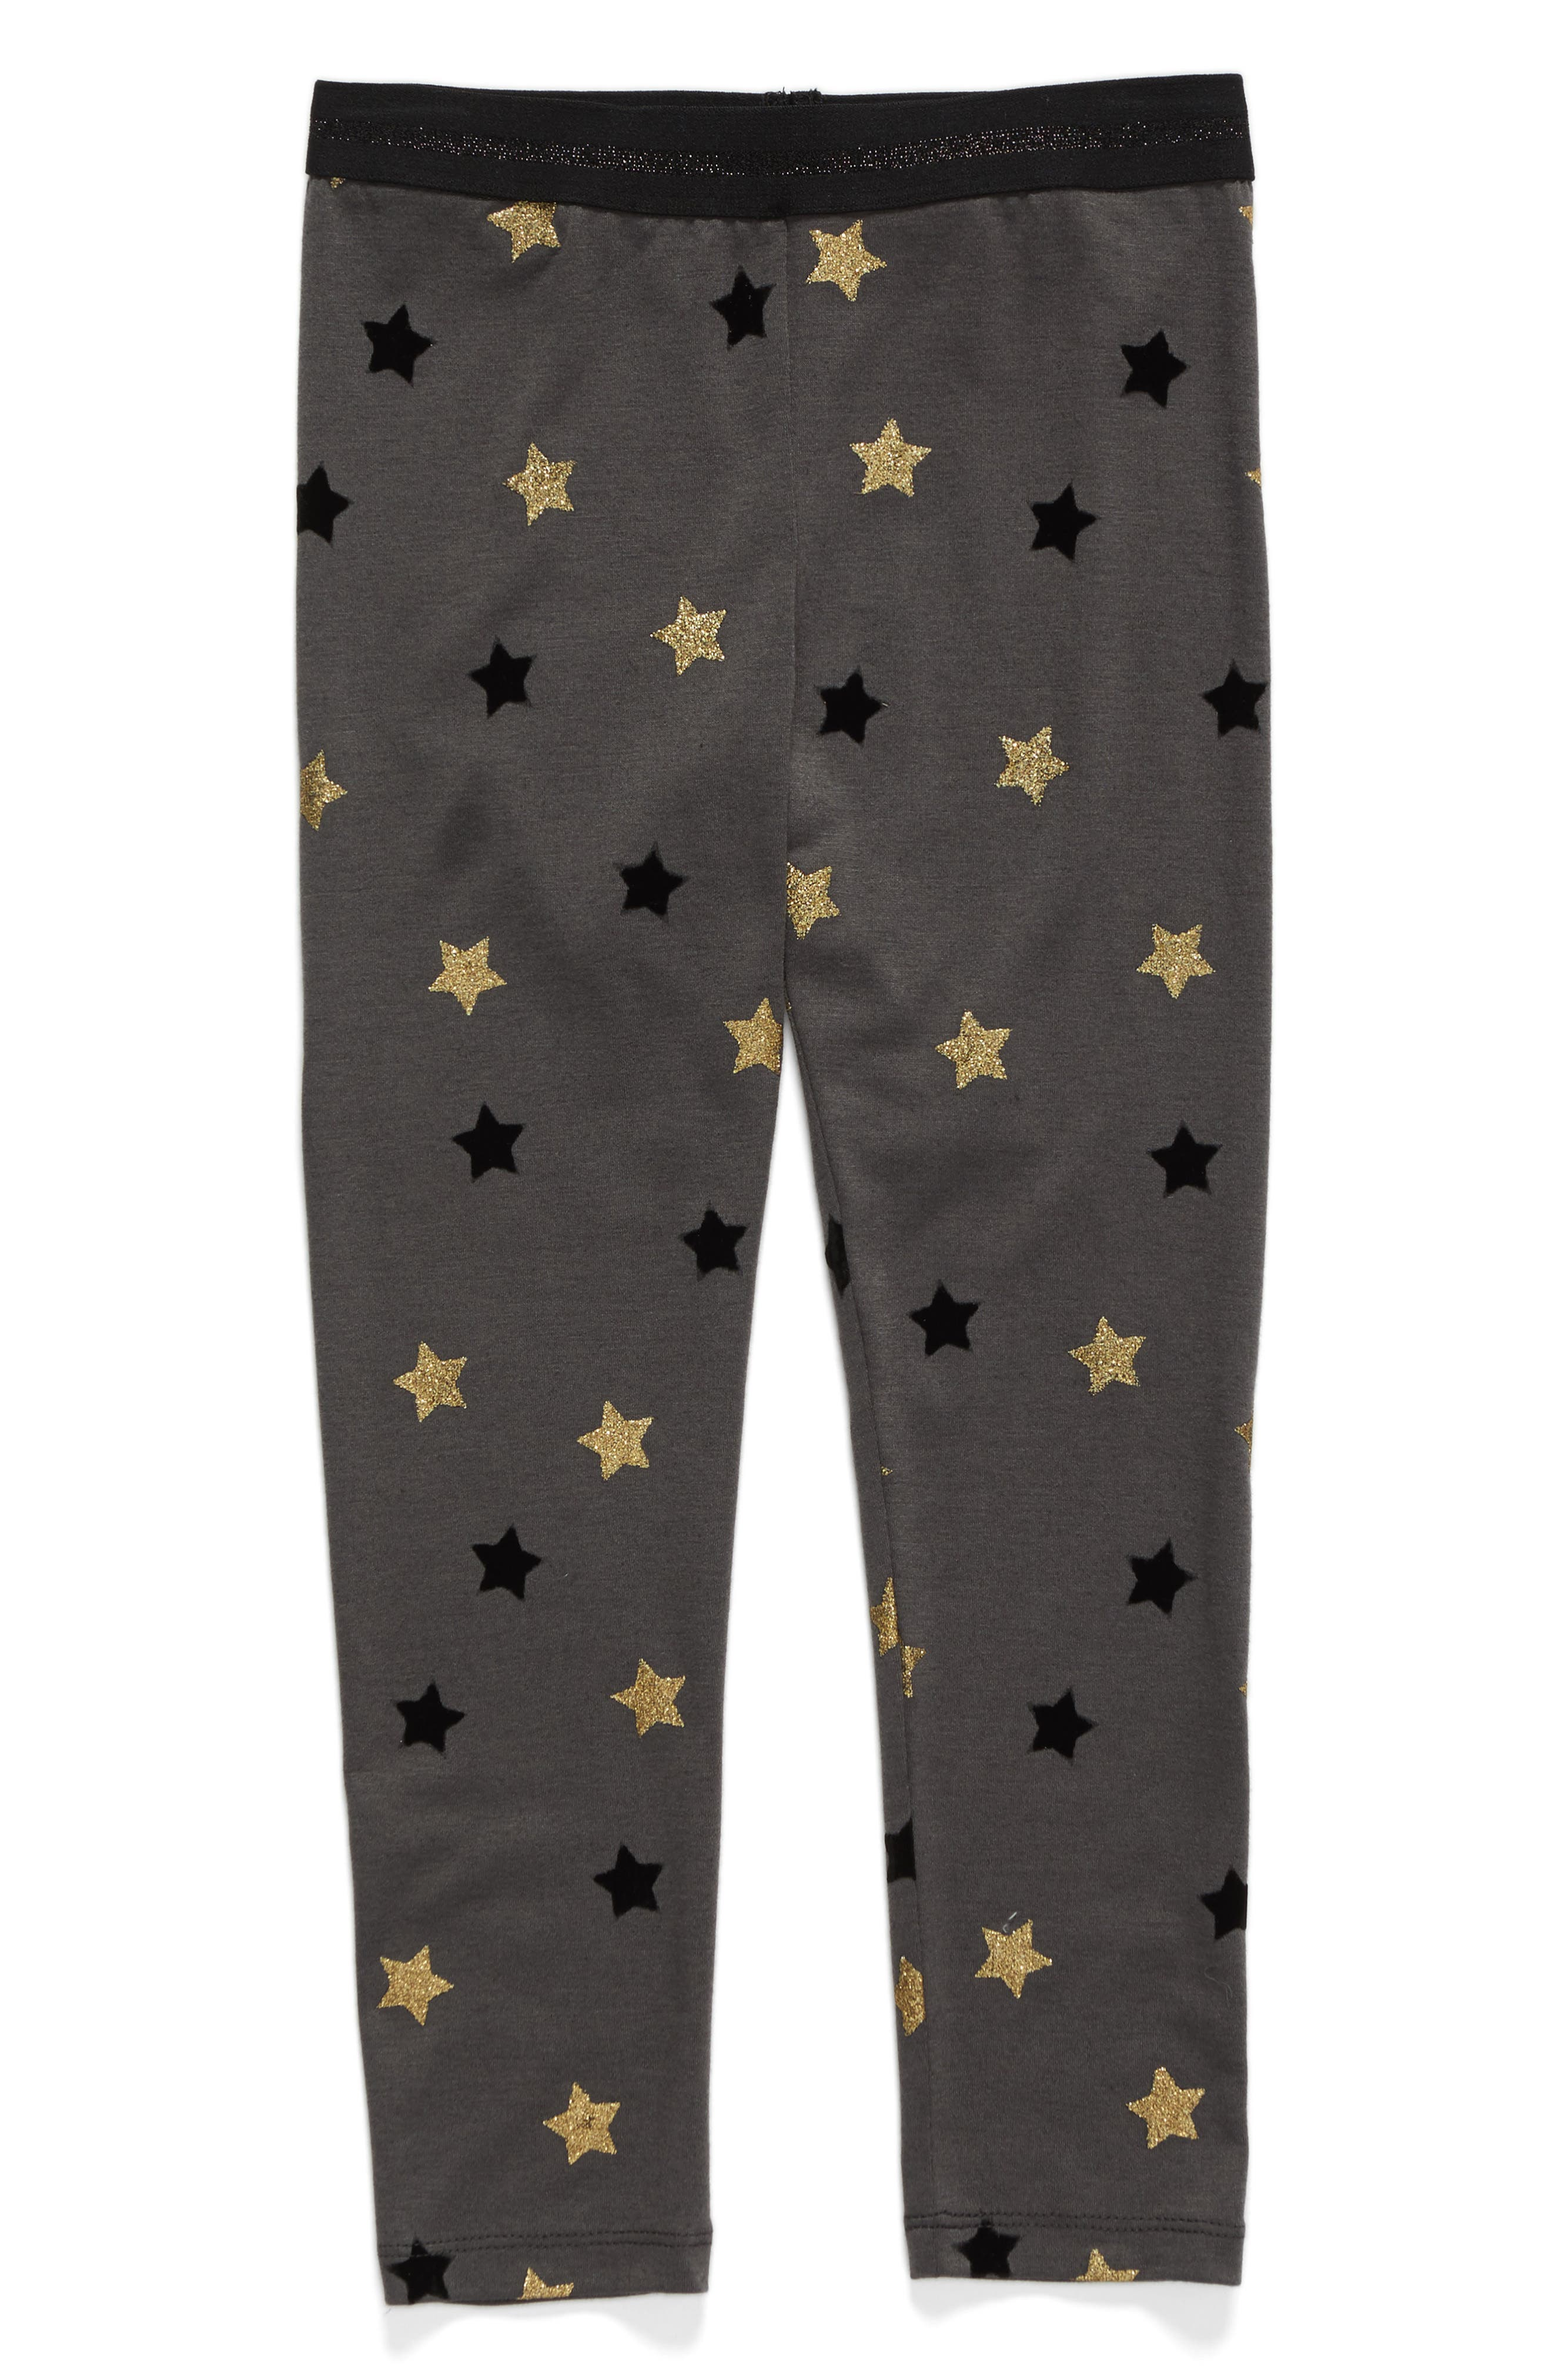 TRULY ME Star Print Leggings